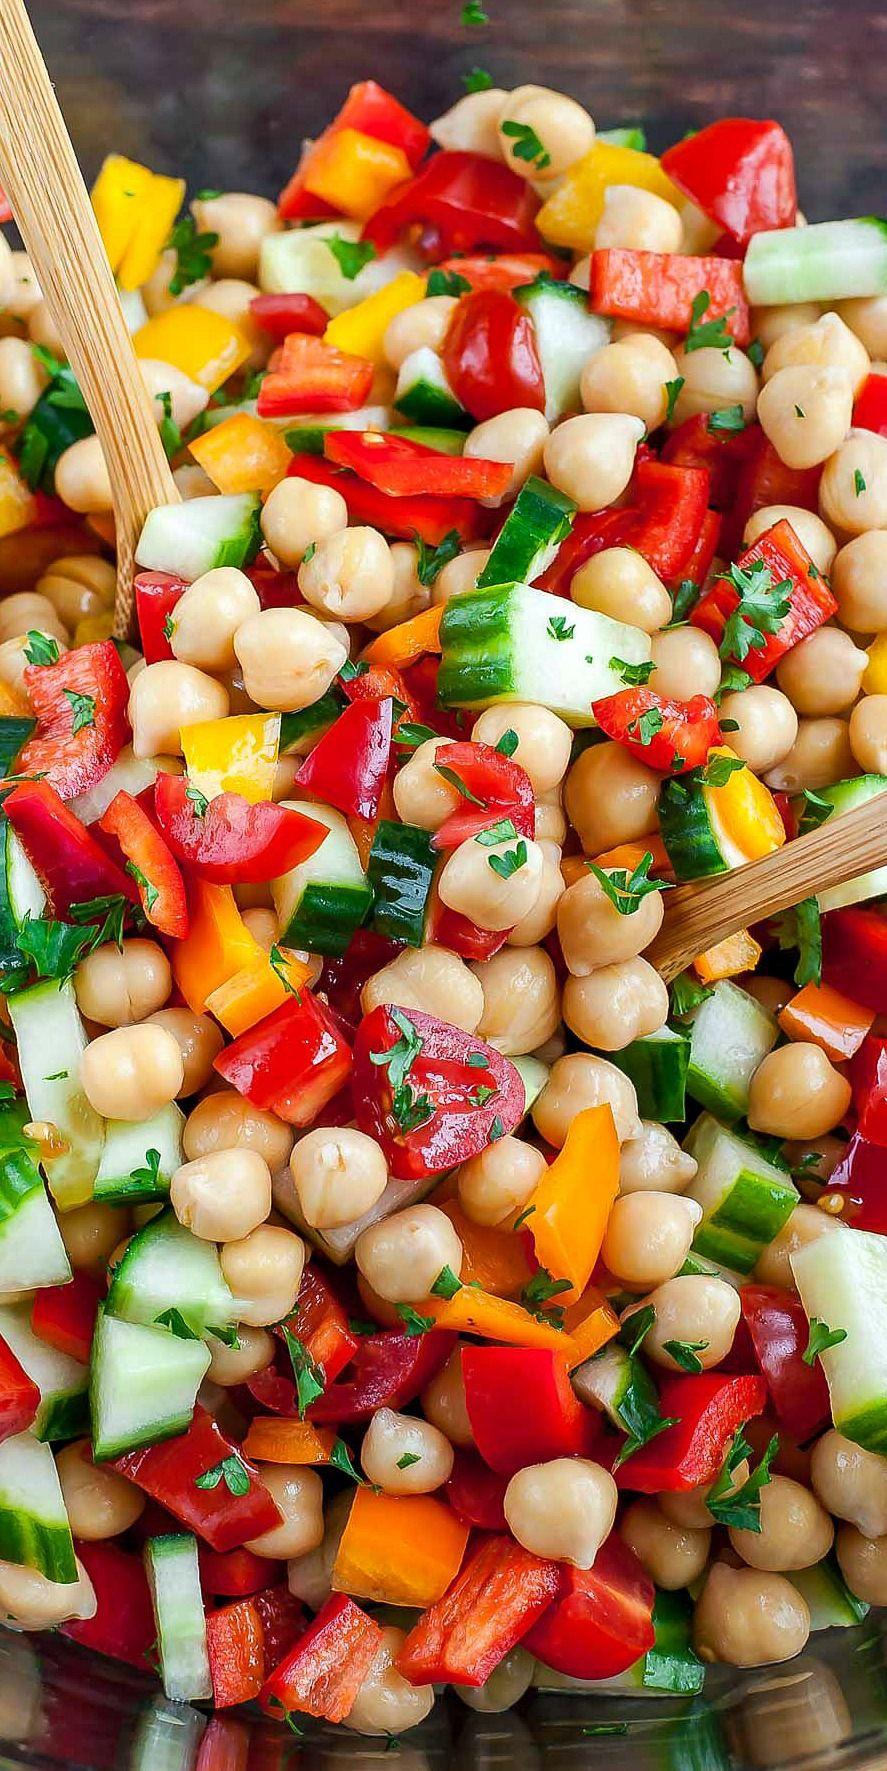 Greek Chickpea Salad Recipe Vegetarian And Gluten Free Recipe In 2020 Greek Chickpea Salad Greek Chickpeas Vegetarian Salad Recipes